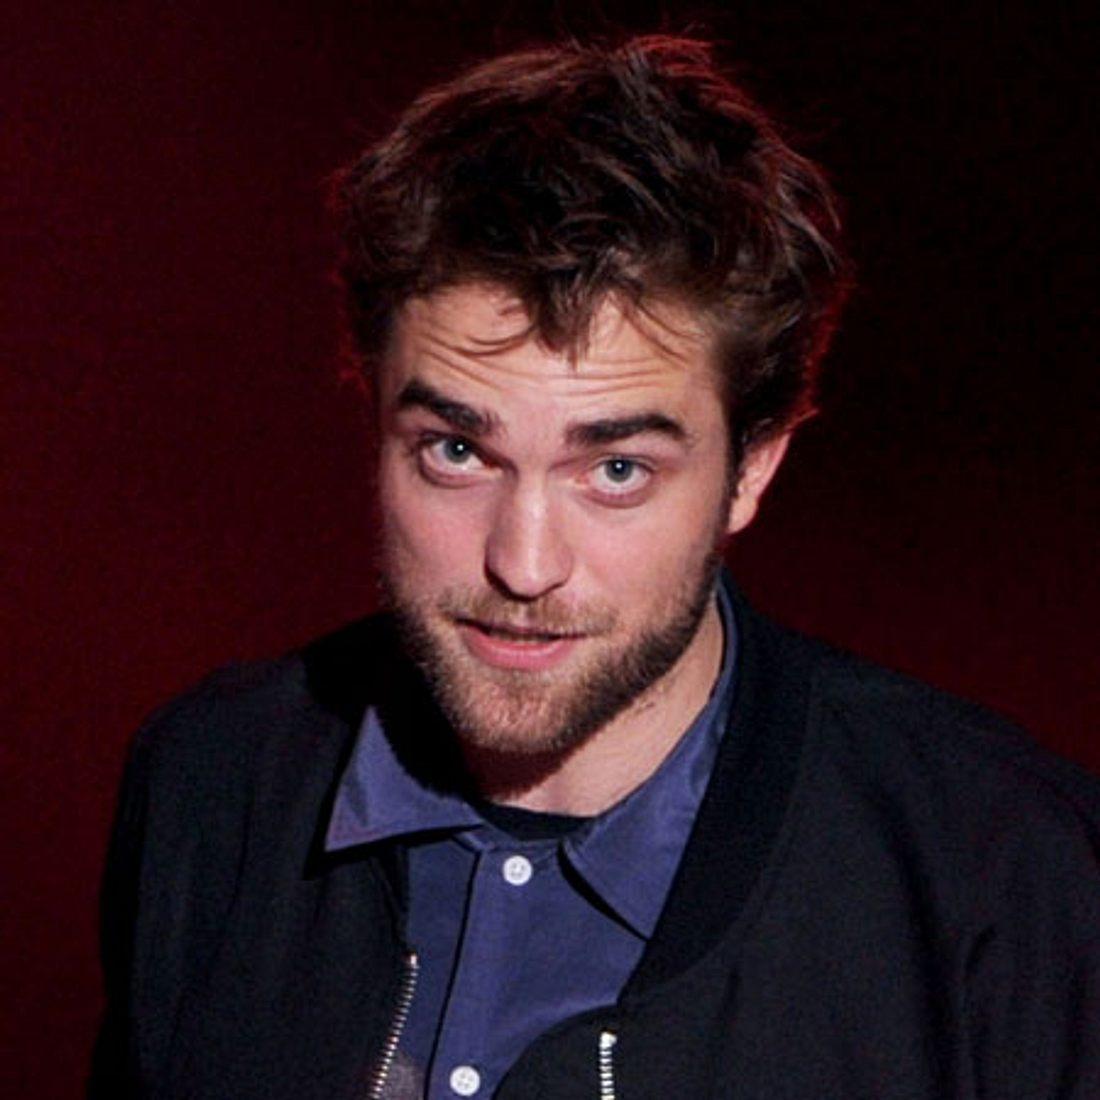 Robert Pattinson geht in Offensive